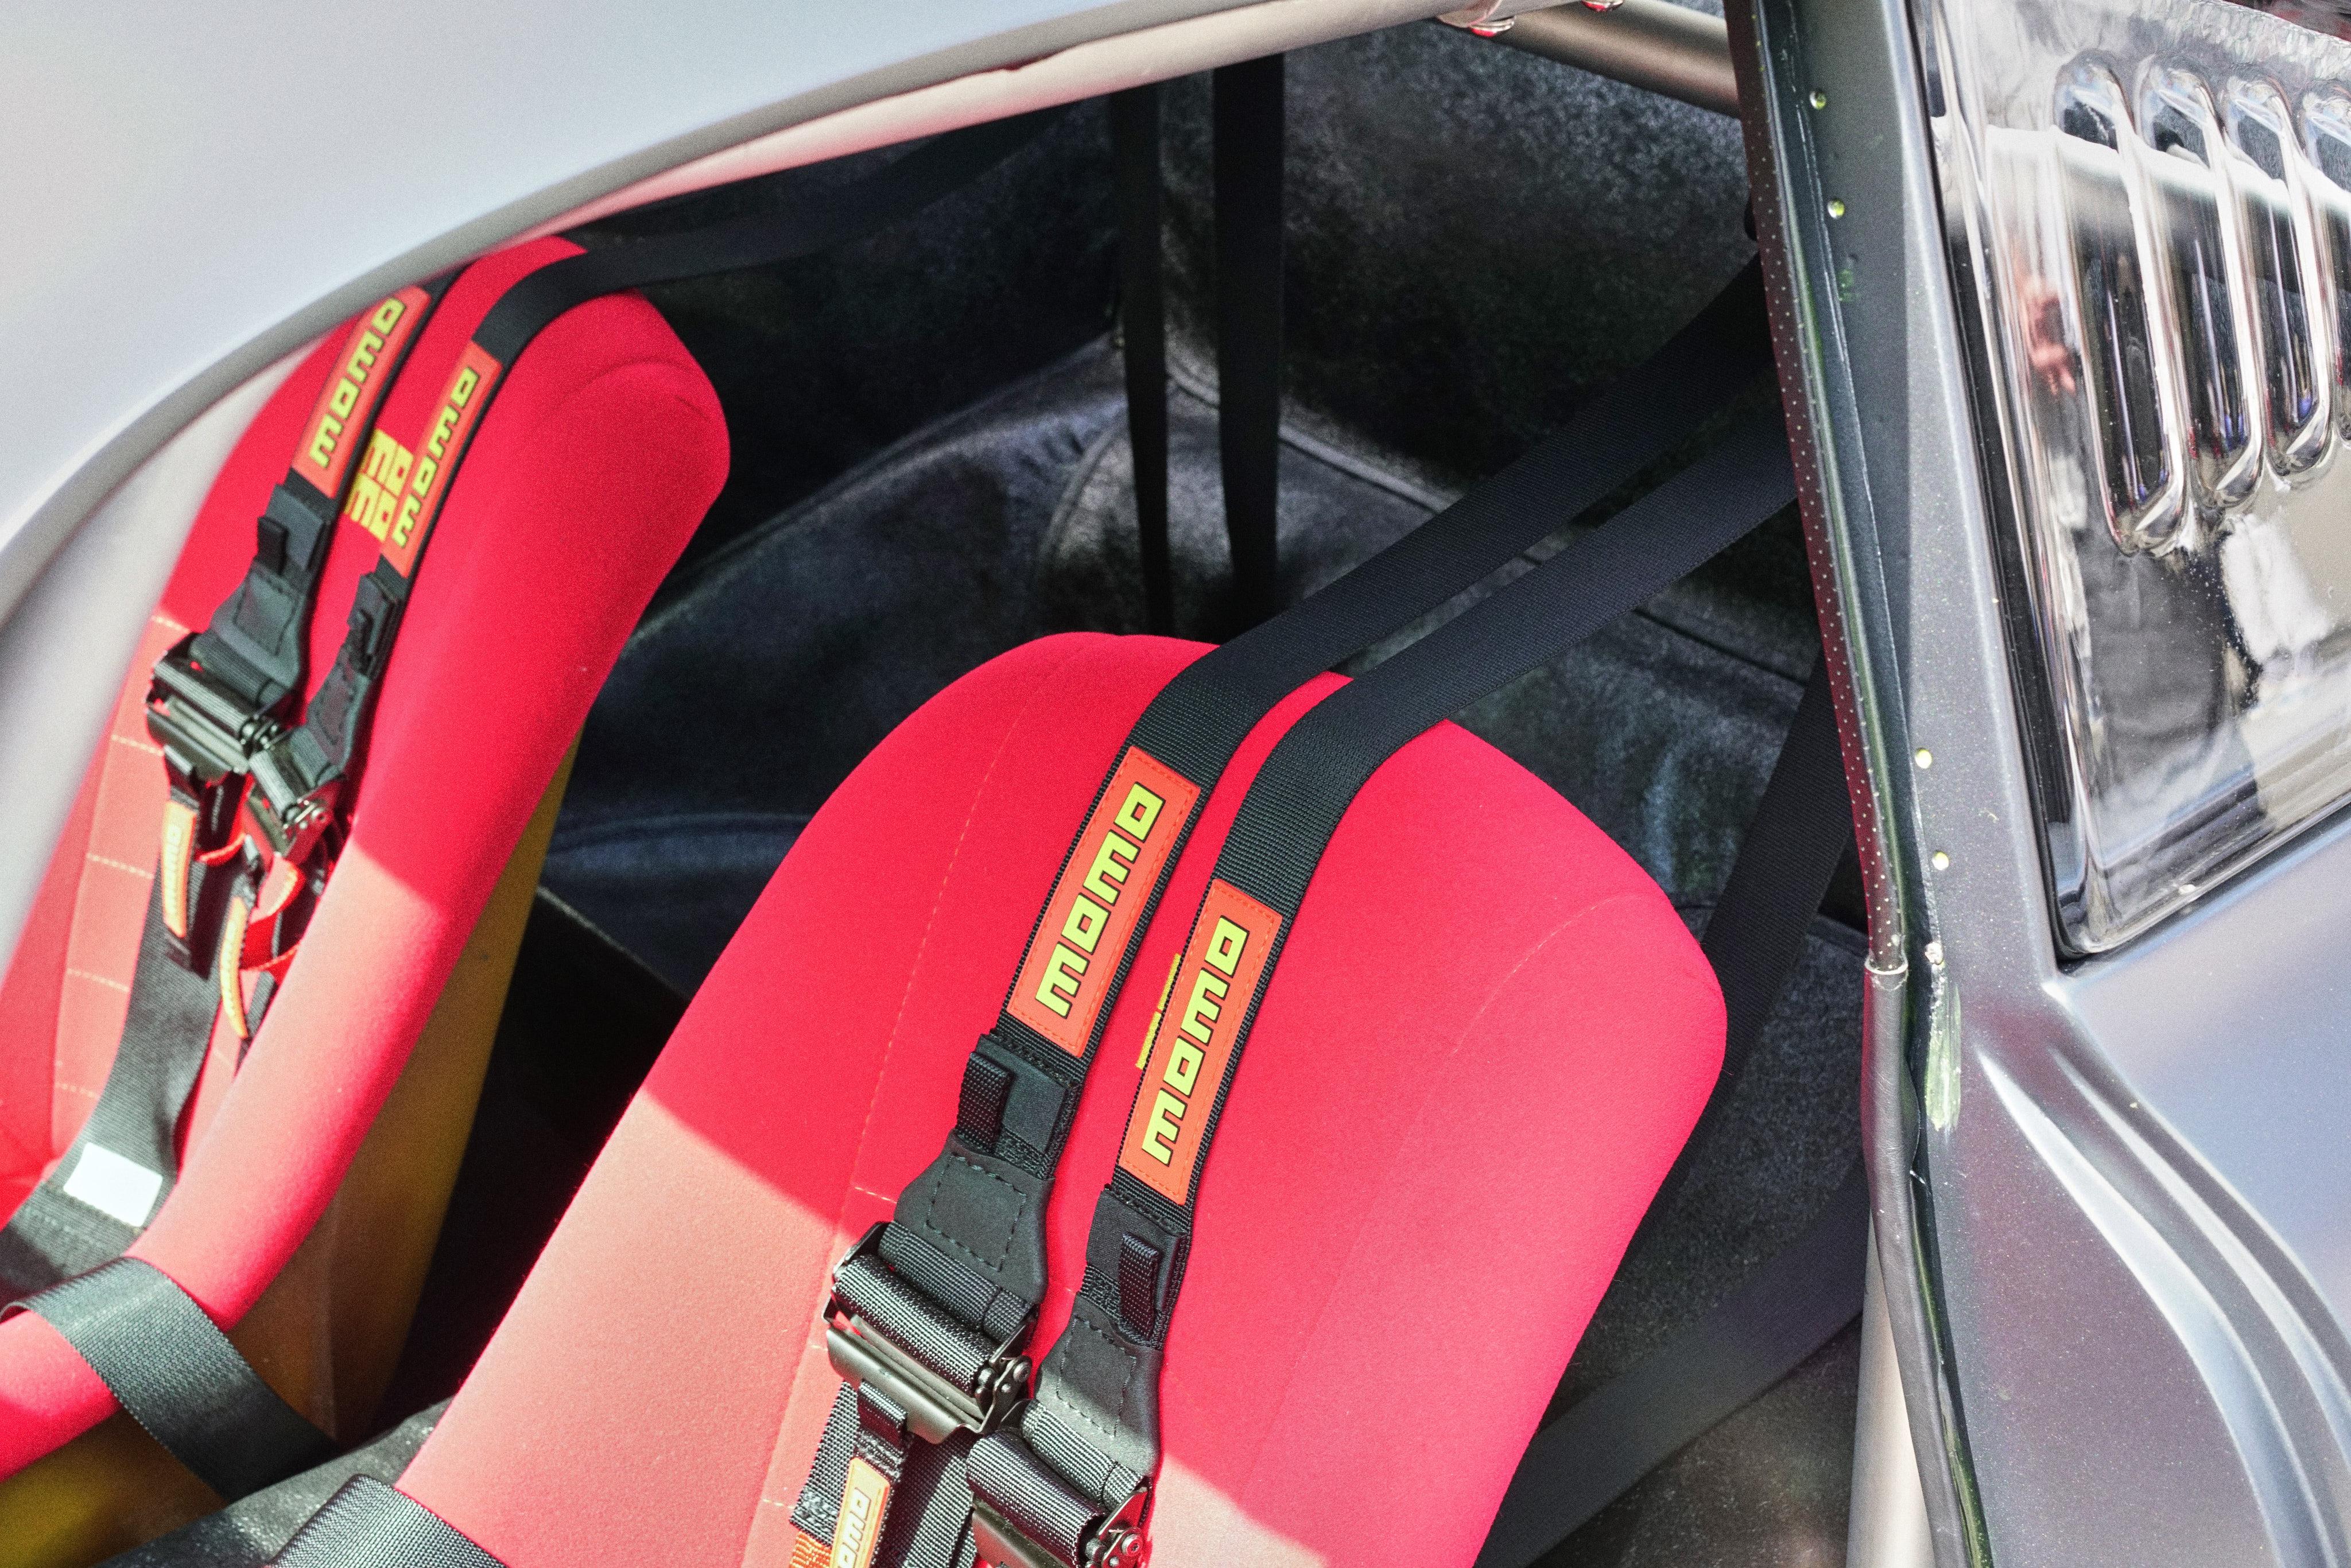 Luftgekühlt-6-Rennen-45-Porsche-356-1960-RSR-Rod-Emory-Special